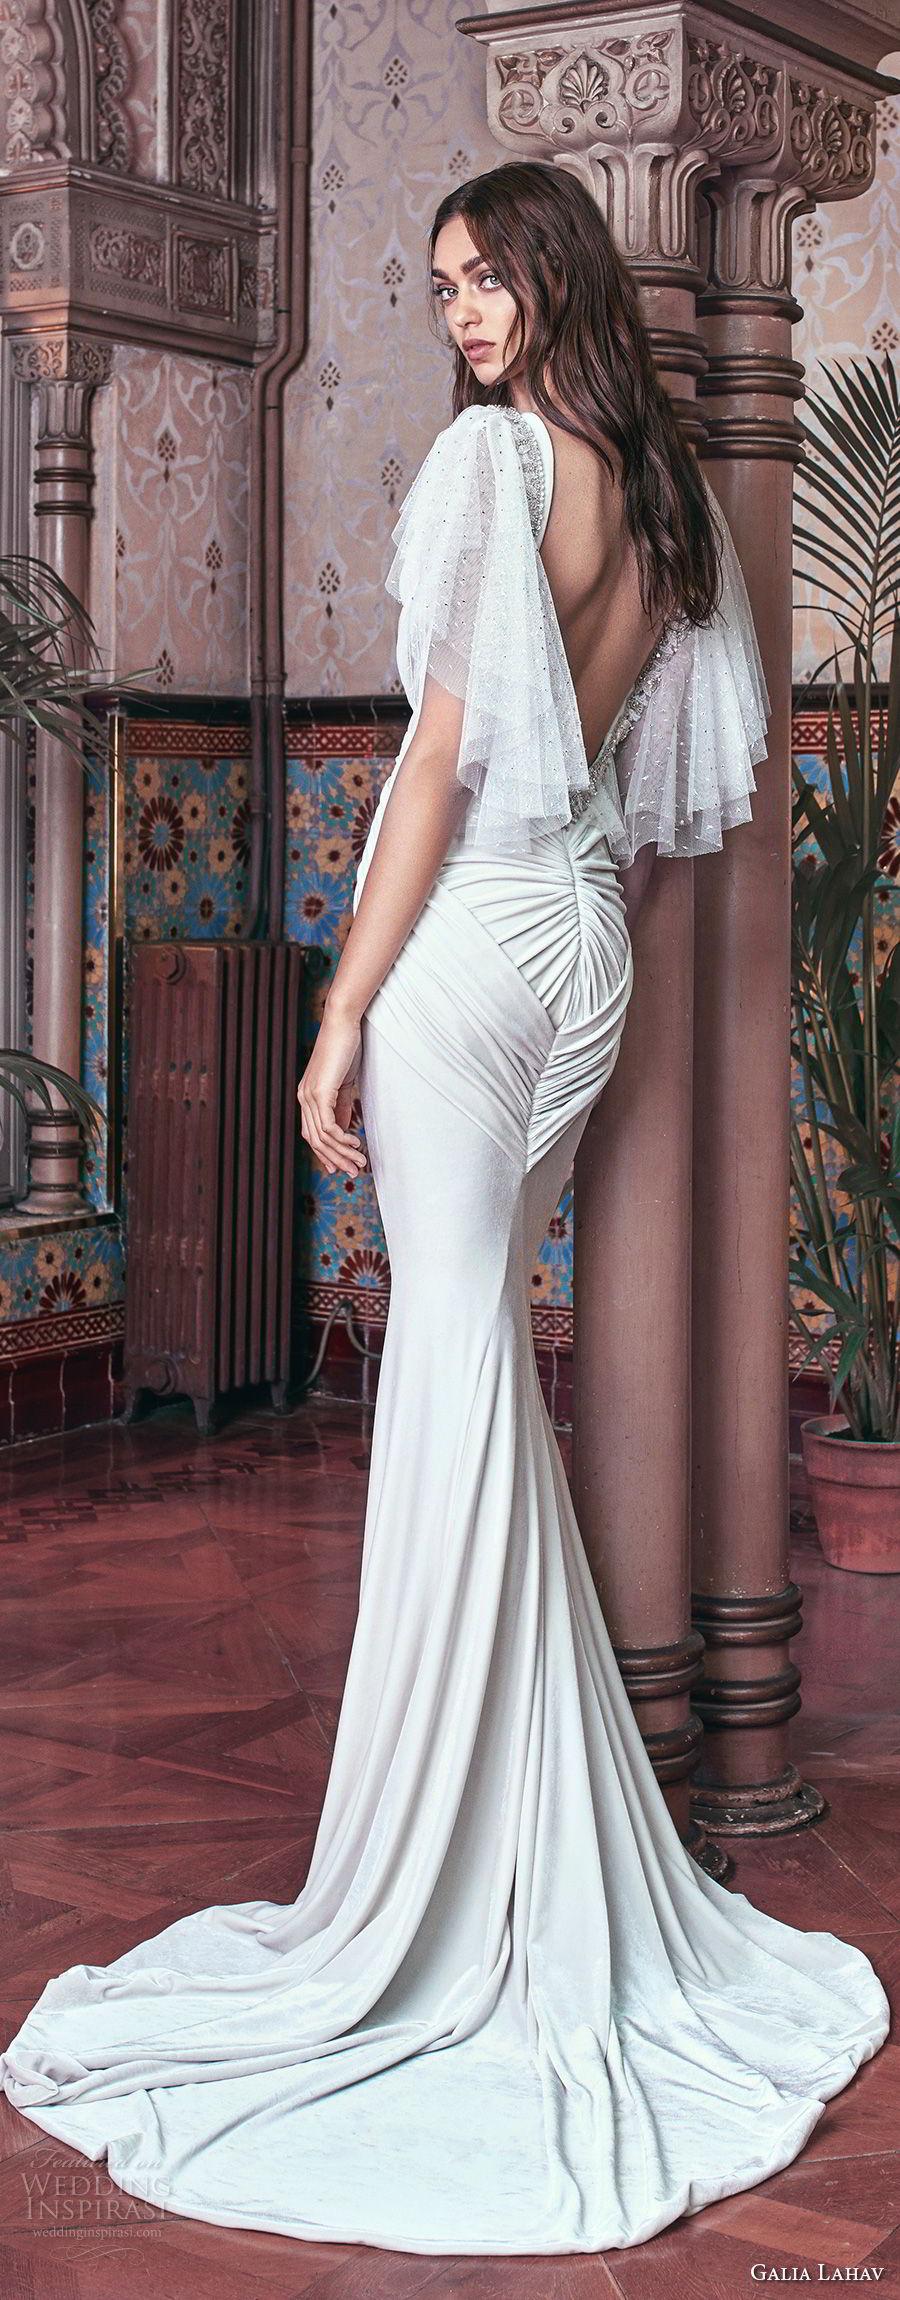 galia lahav spring 2018 bridal circular sleeves deep plunging v neck lightly embellished bodice grecian elegant sheath wedding dress open low back sweep train (velvet) bv